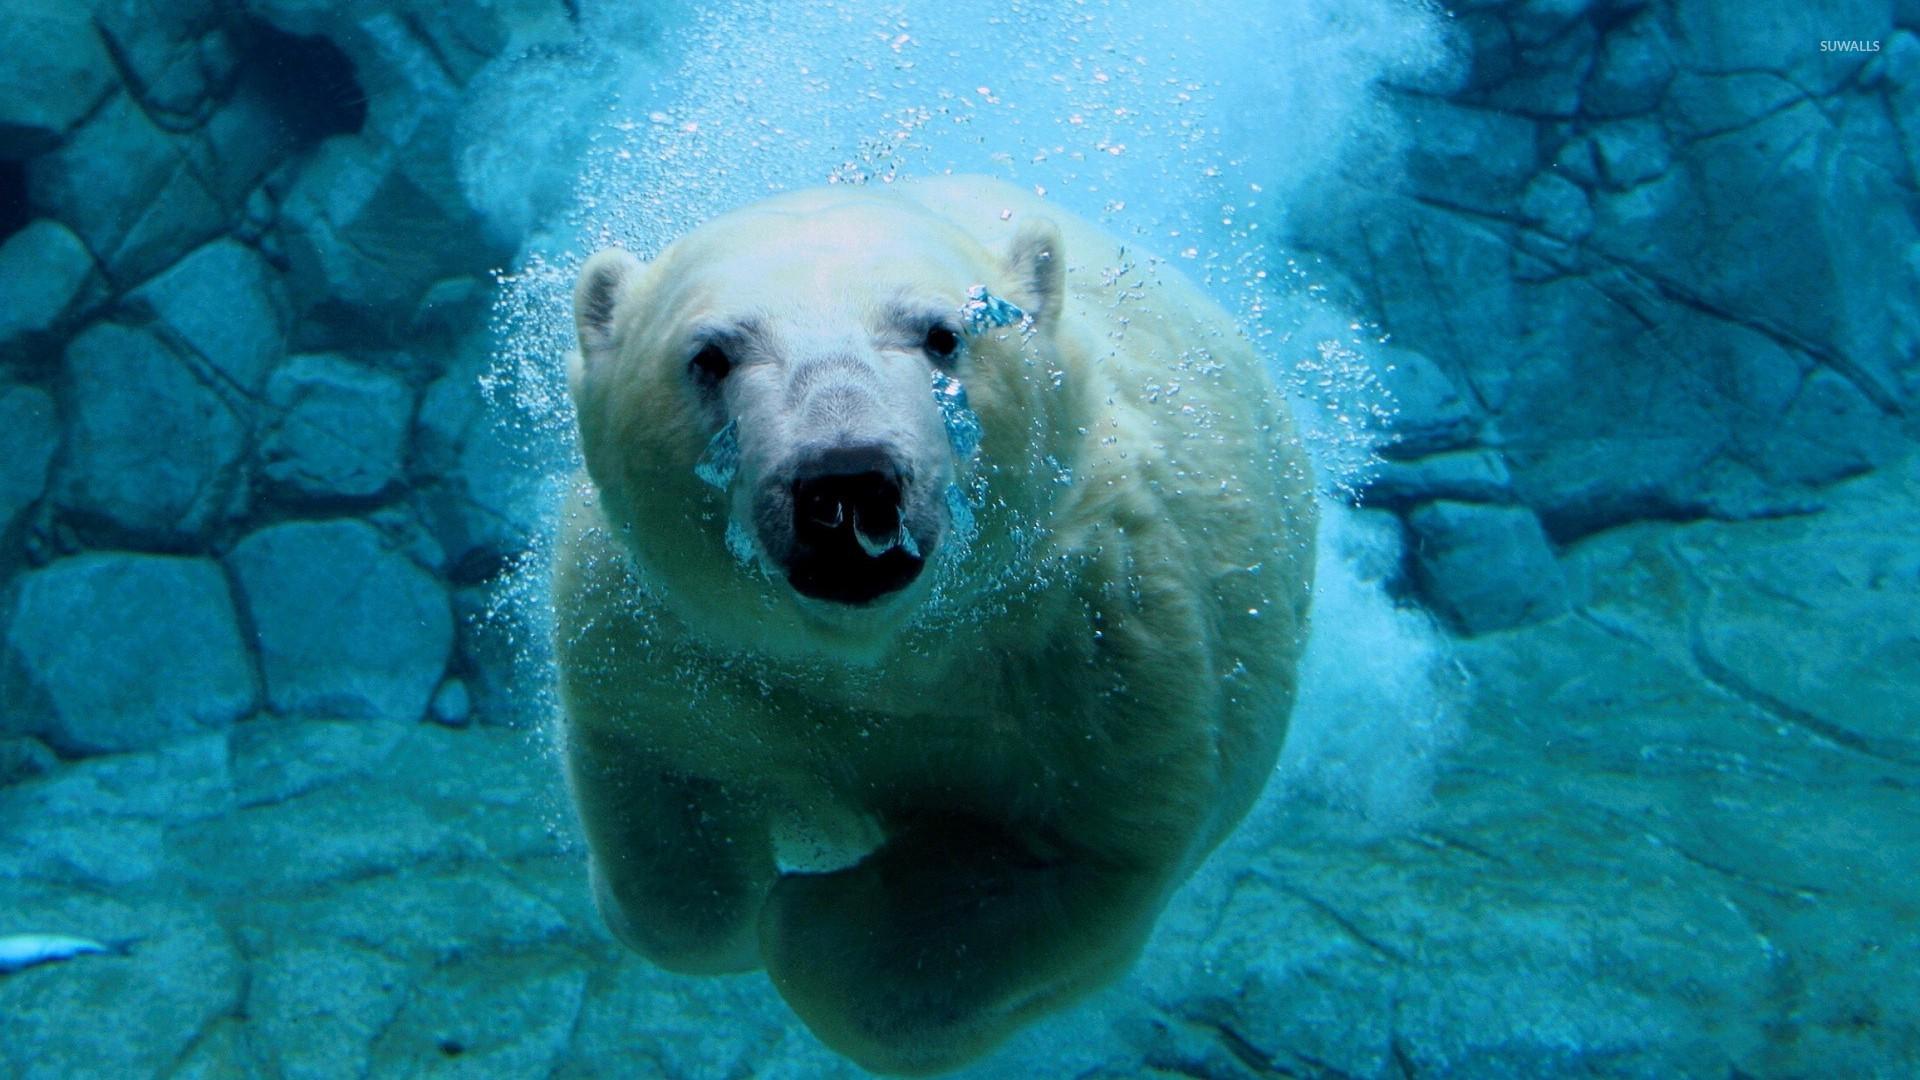 polar bear swimming under water wallpaper - animal wallpapers - #49284